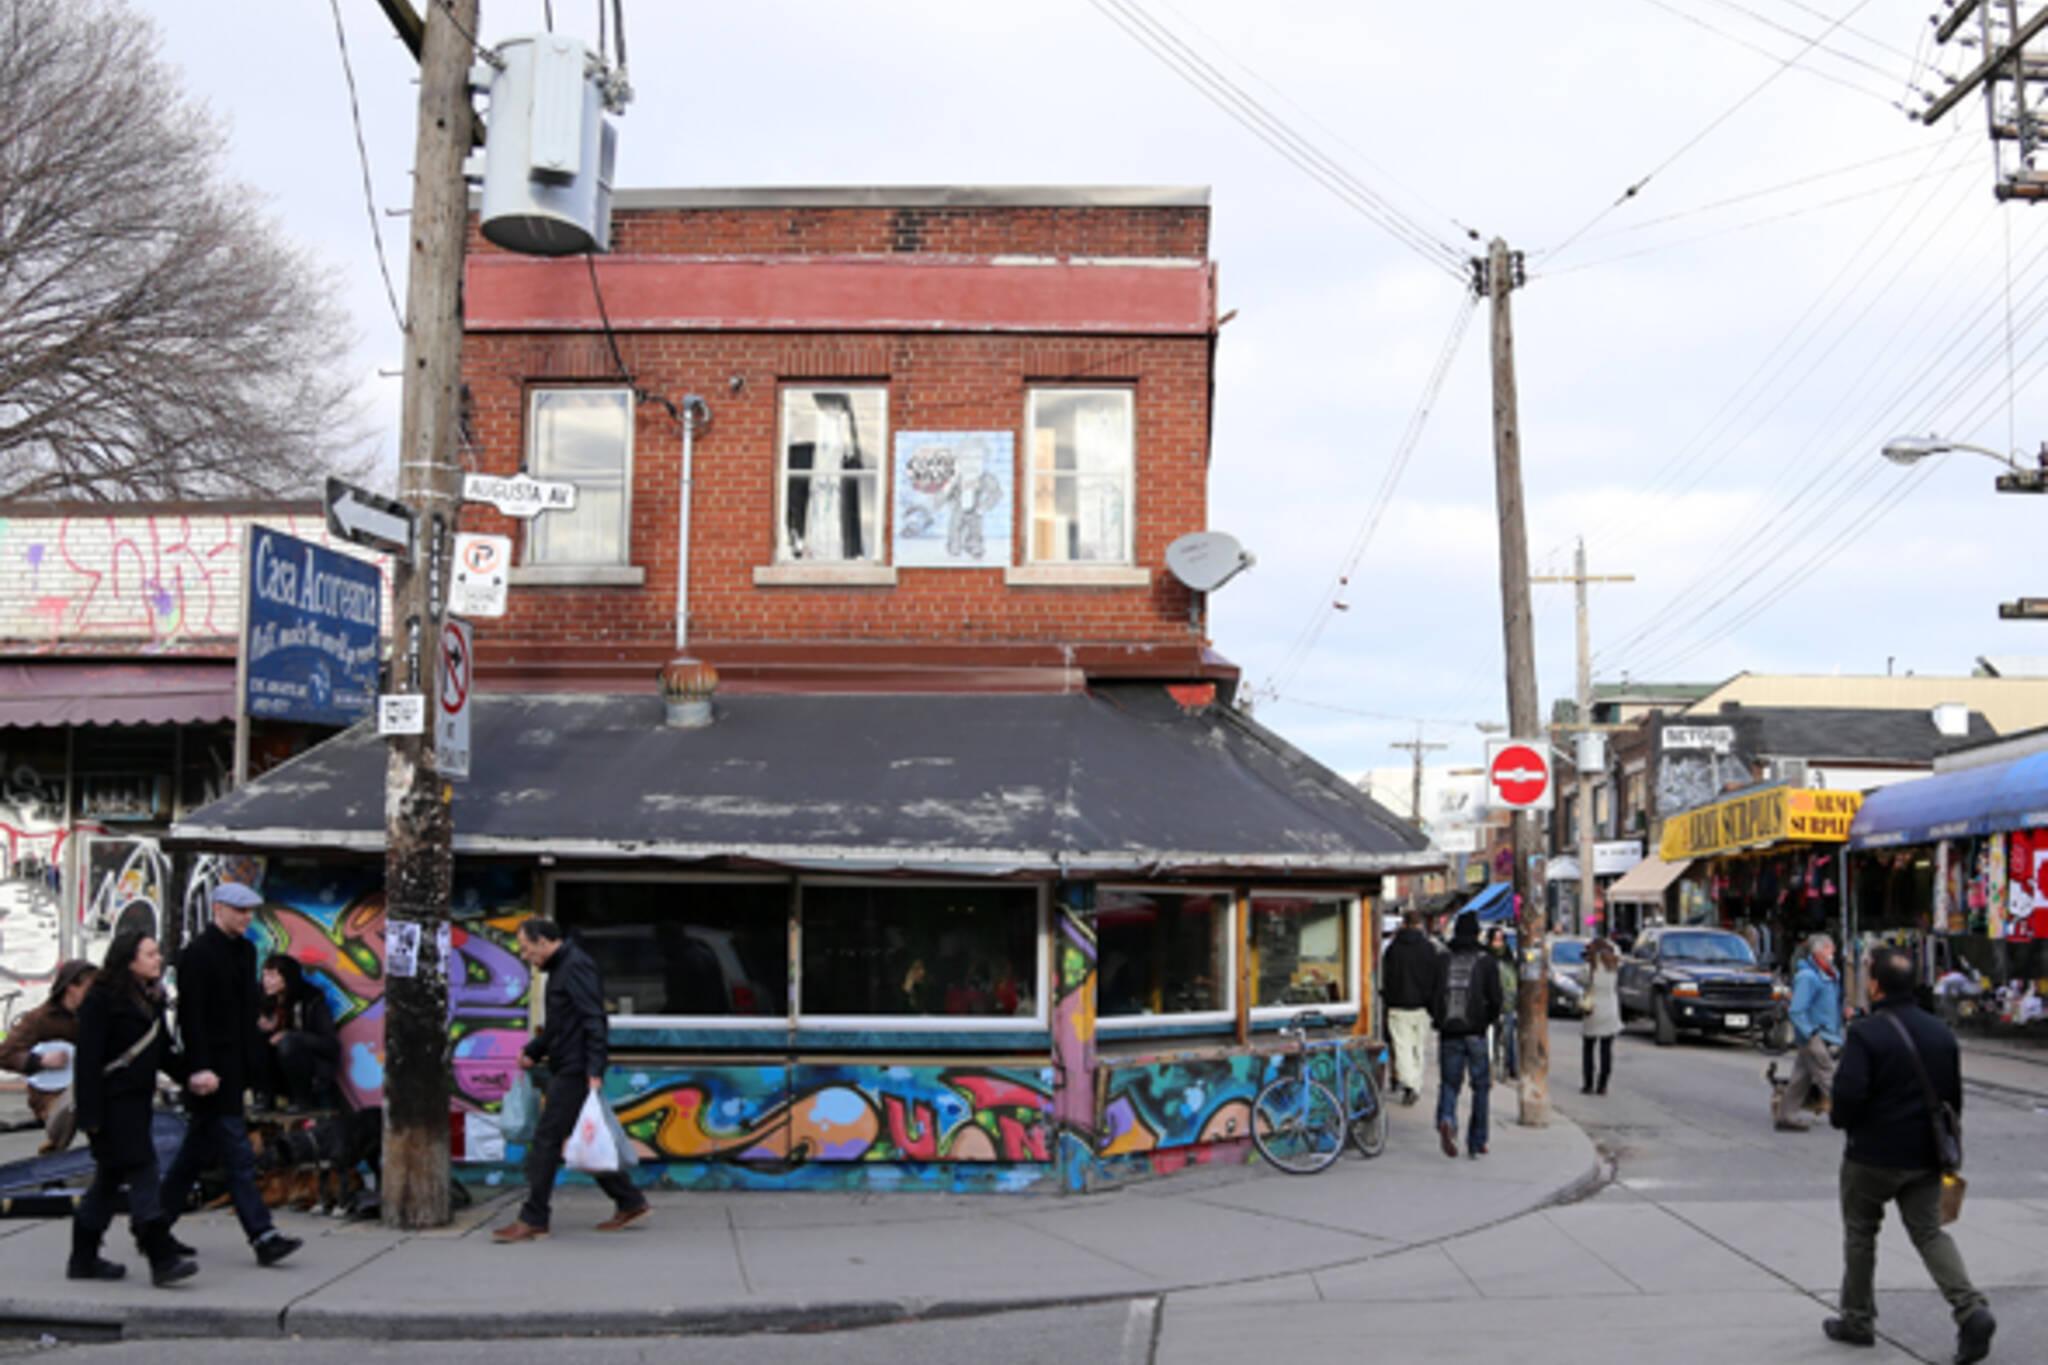 Kensington Coffee Shop